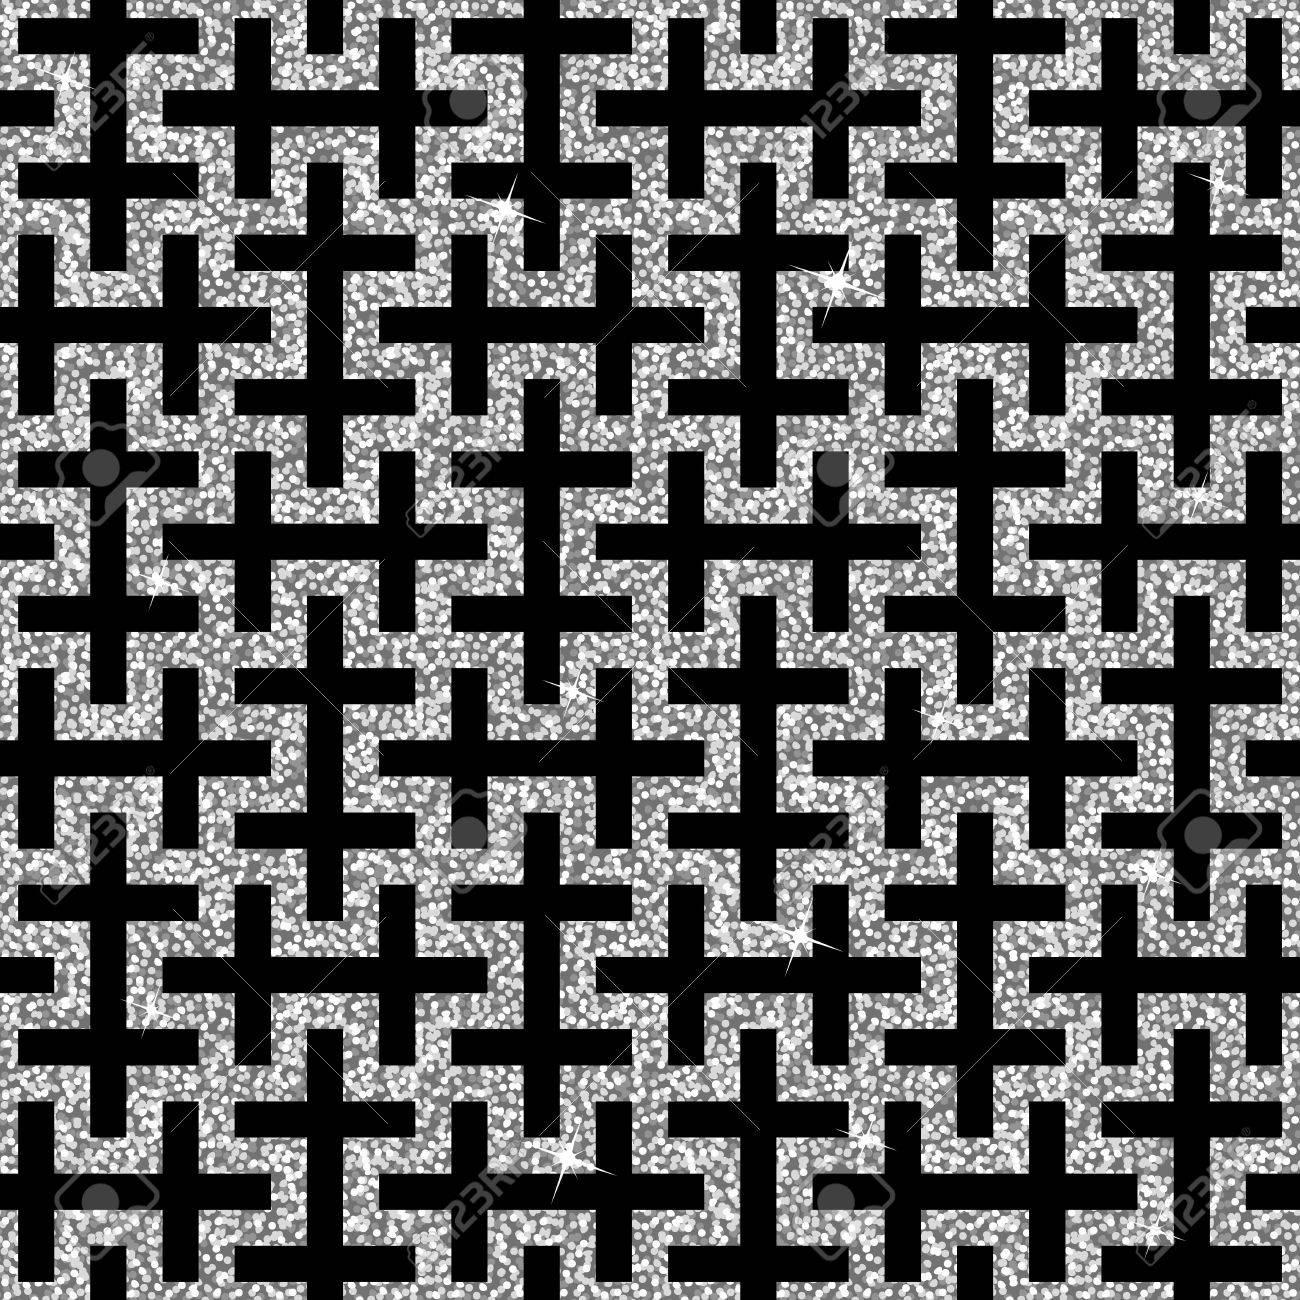 Seamless Background A Partir D Un Ornement De Croix Gammee D Argent